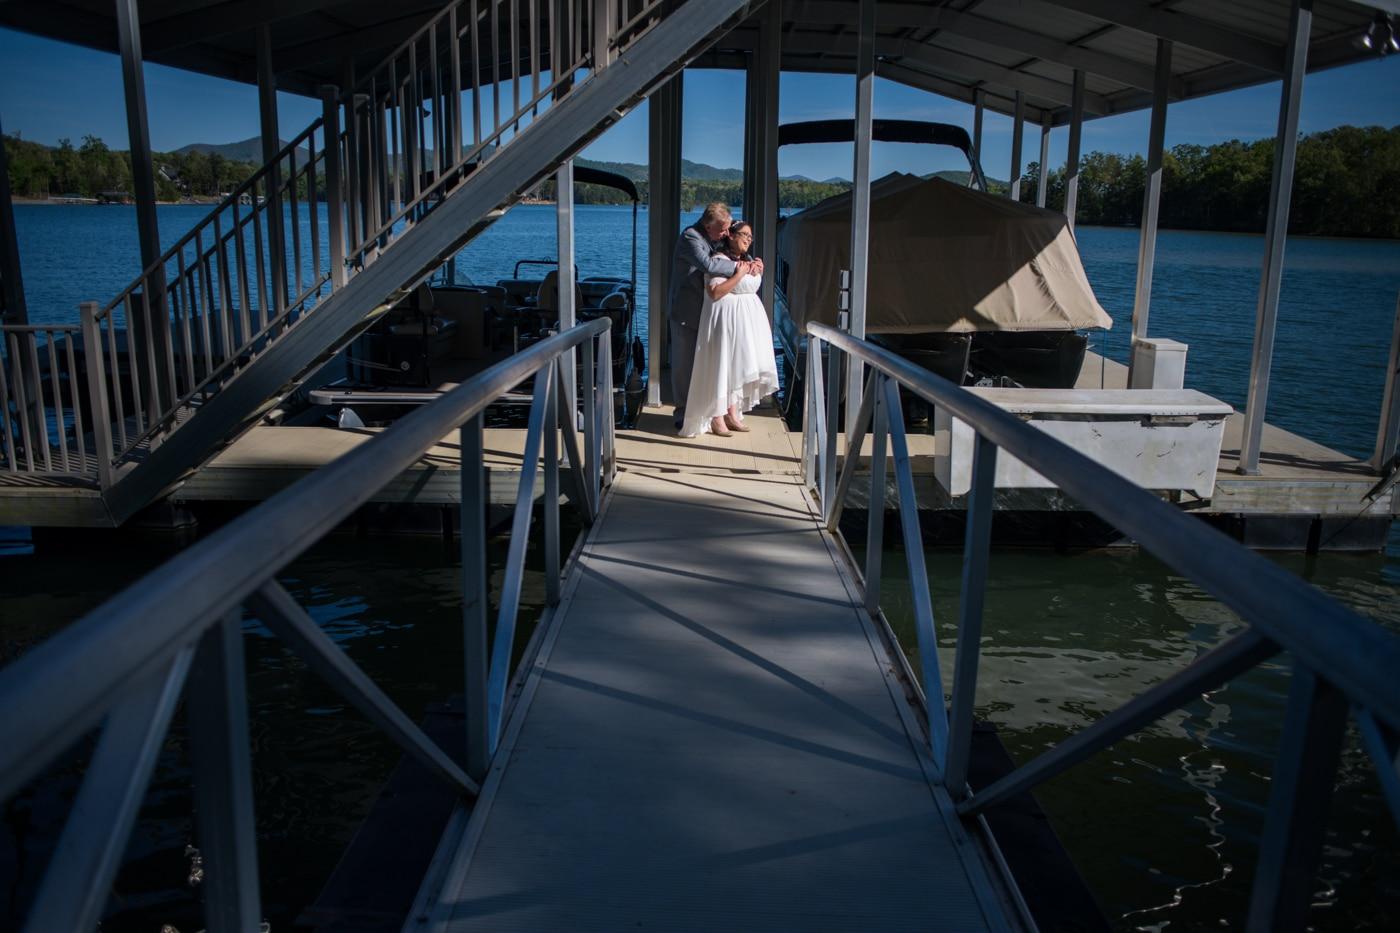 newlyweds kiss on boat dock at Lake Blue Ridge